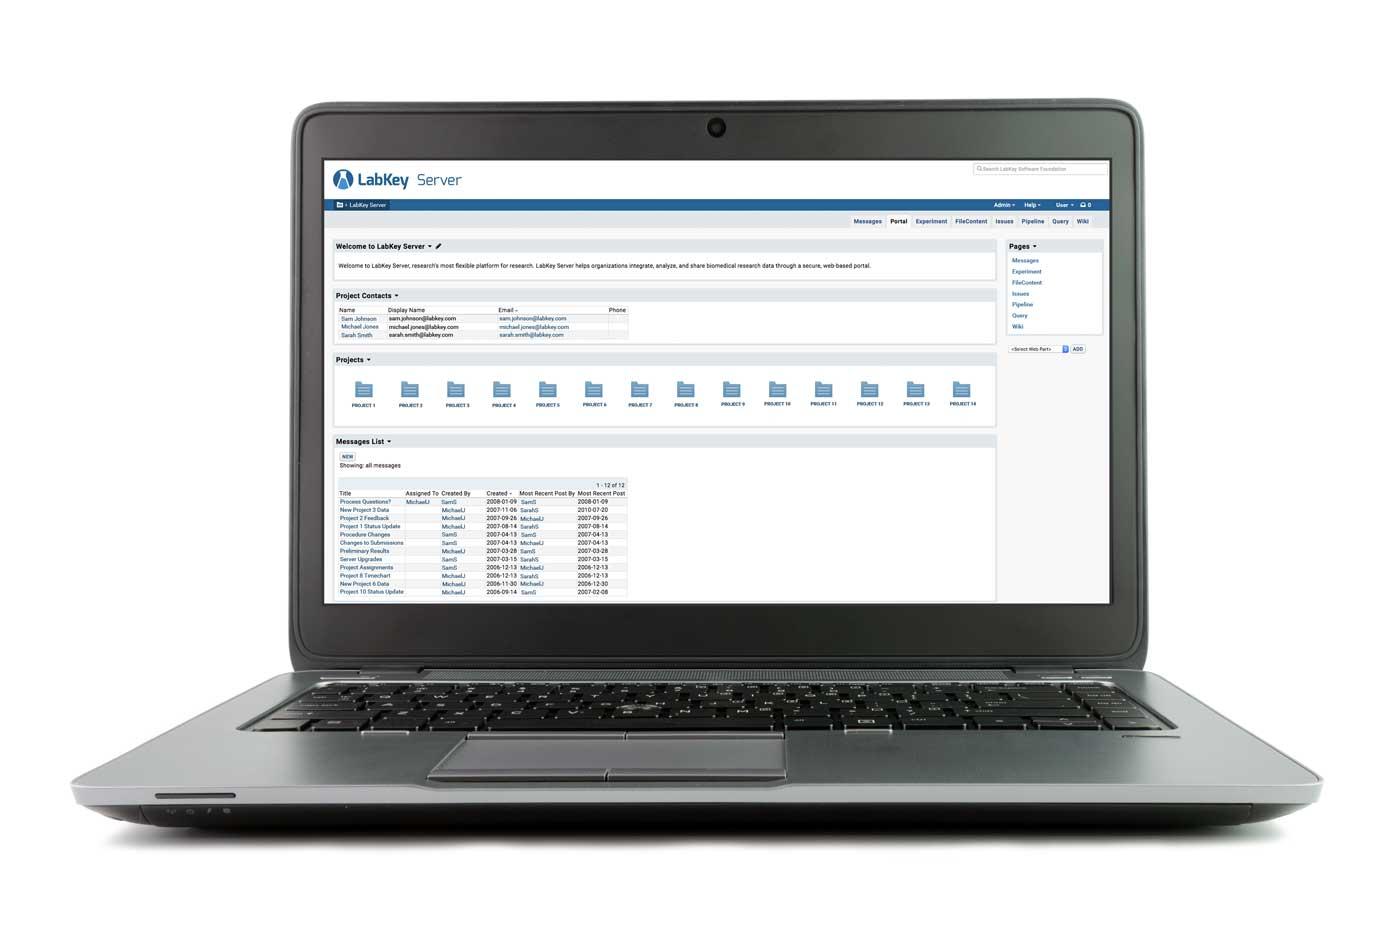 LabKey Server - Open Source Software for Data Integration, Data Mangement, and Scientific Collaboration